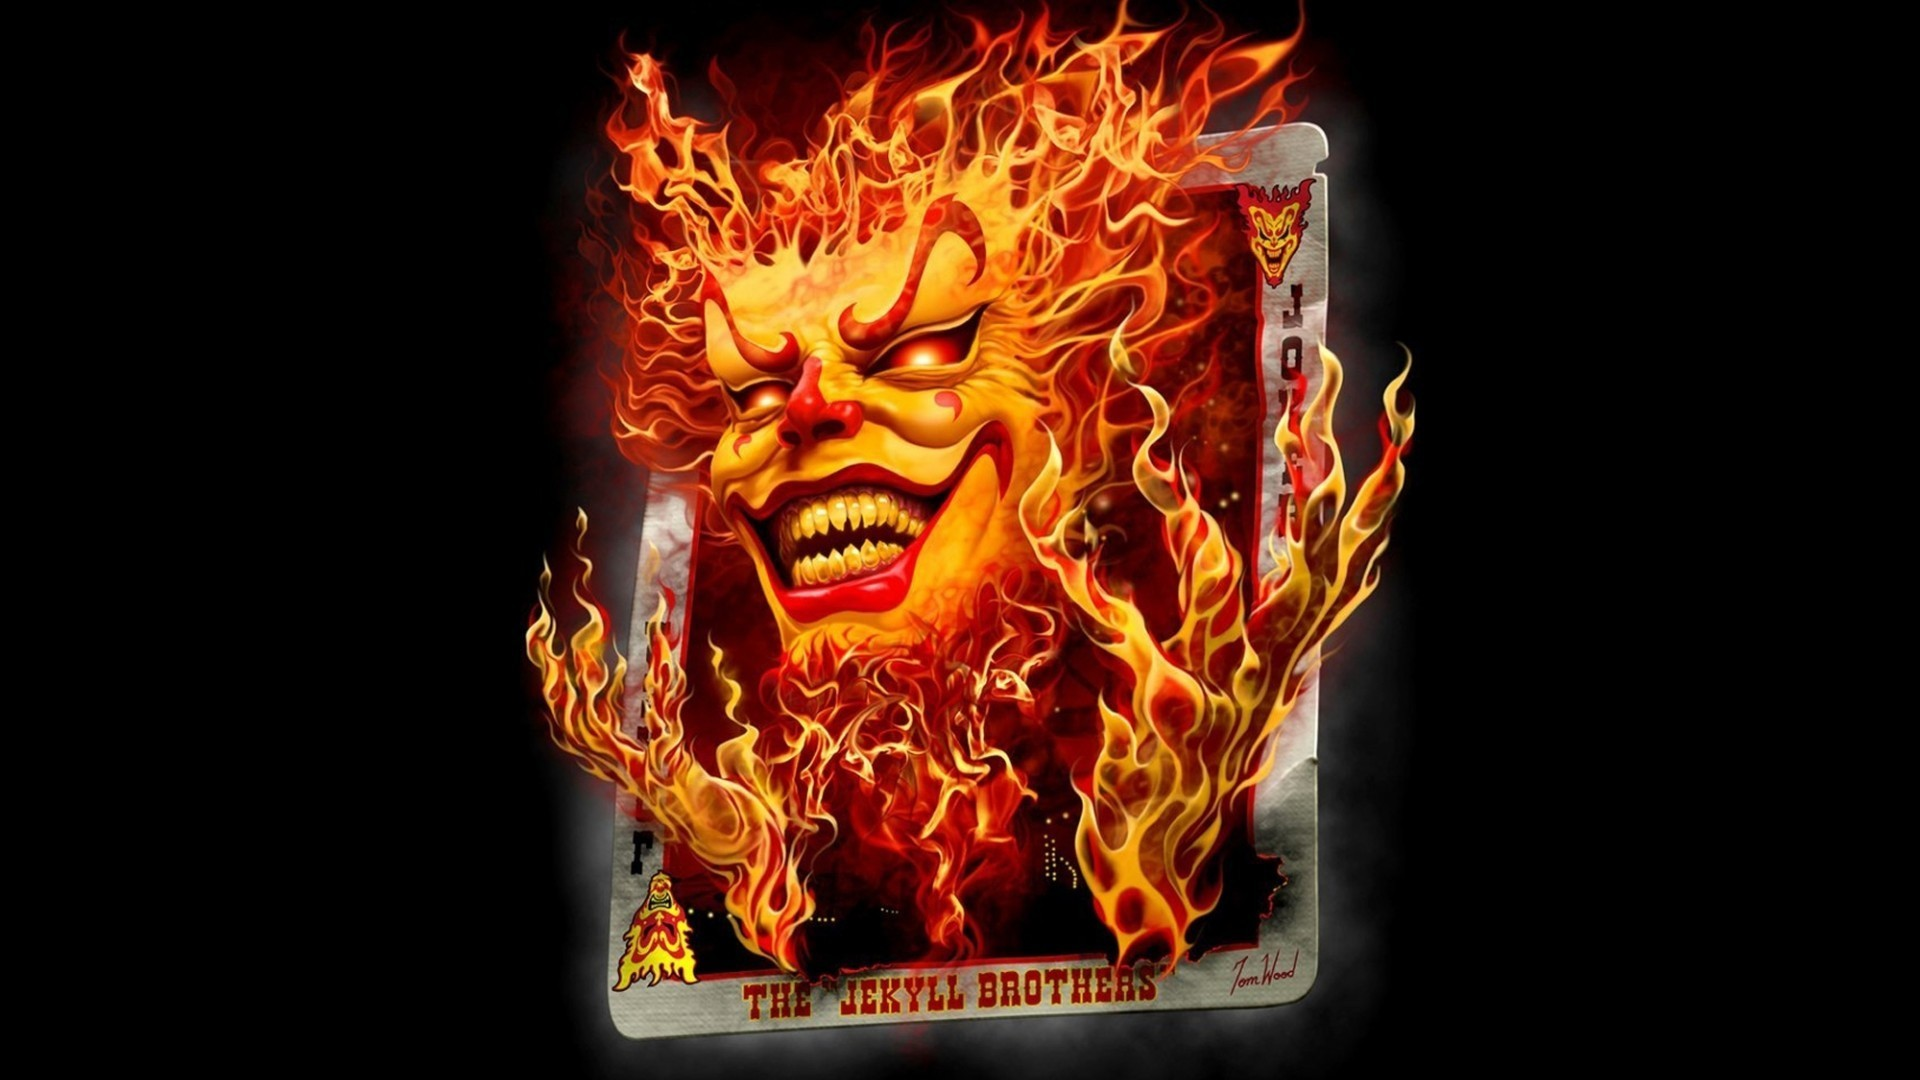 General digital art black background minimalism playing cards  fire Joker smiling devils red eyes Insane